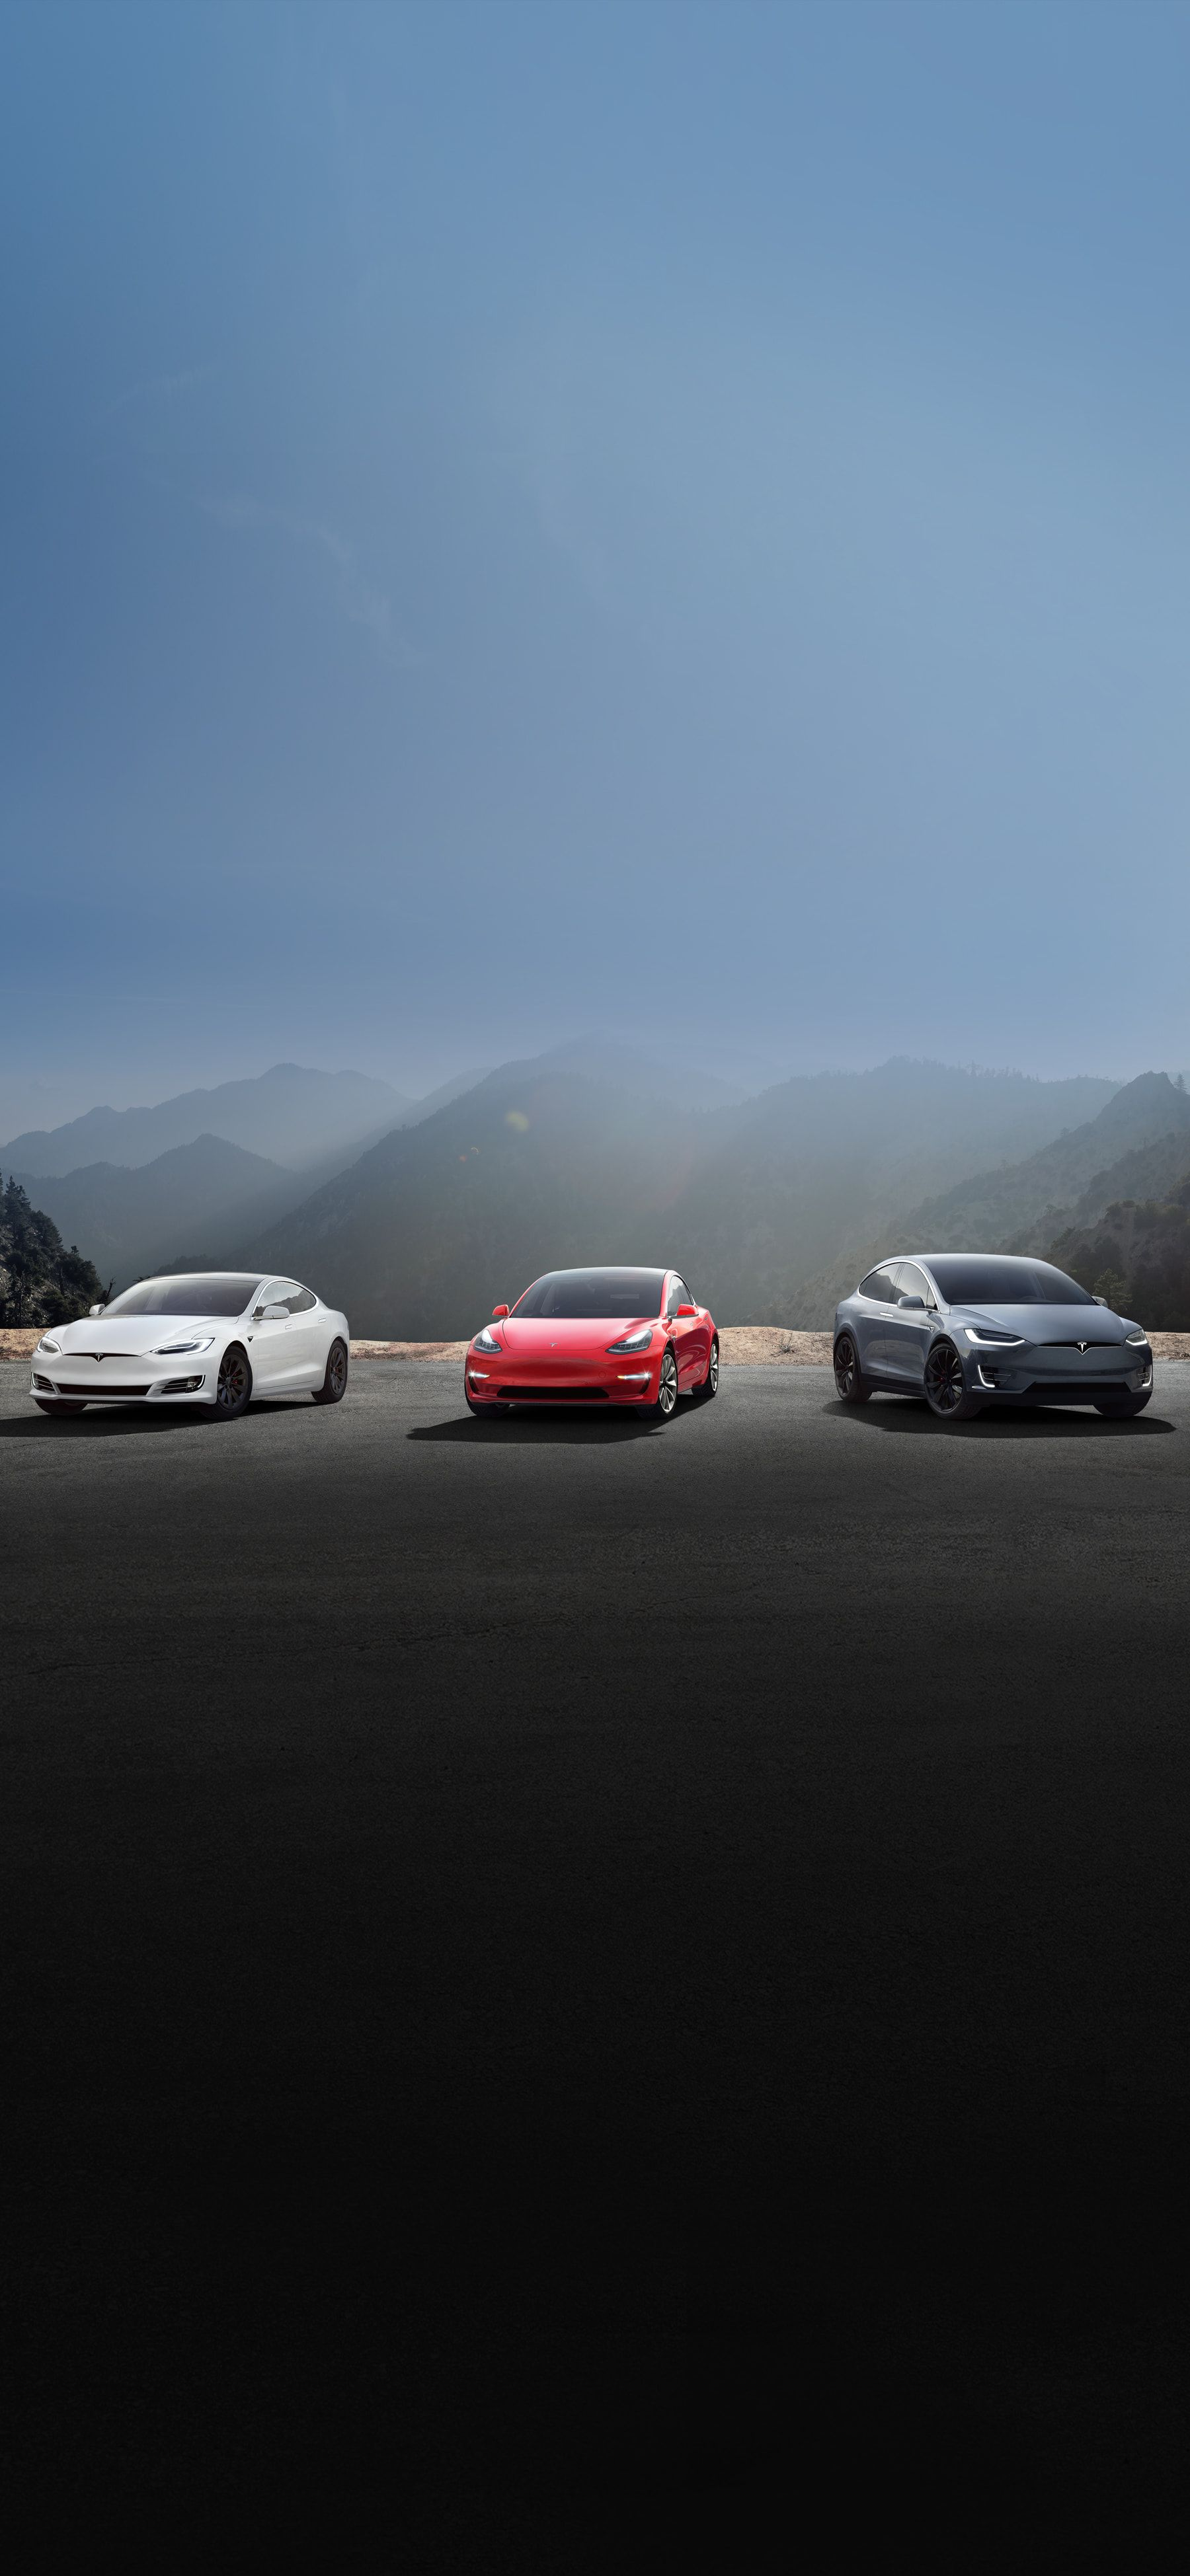 Electric Cars, Solar Panels & Clean Energy Storage Tesla